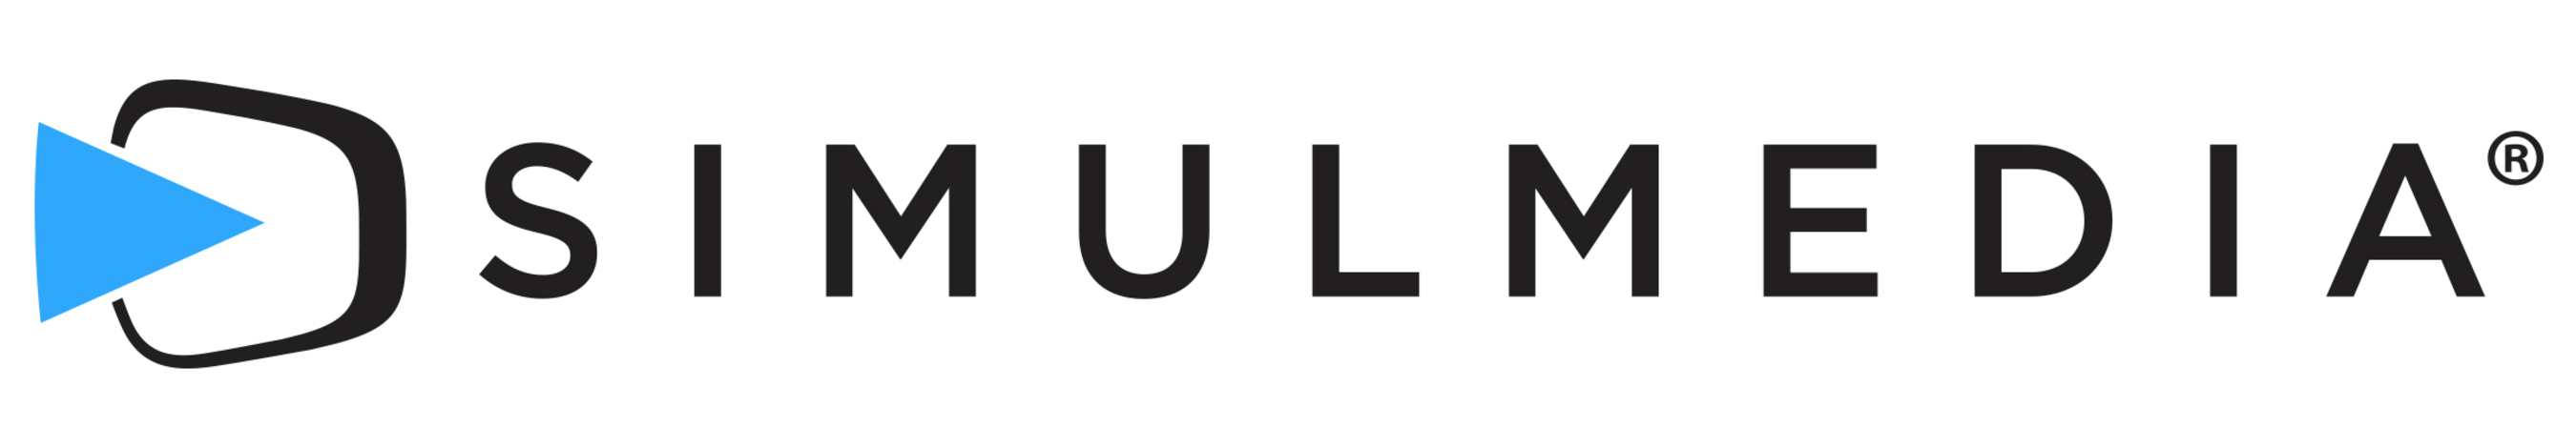 Simulmedia, Inc. ( www.simulmedia.com ) is the leader in helping advertisers and agencies find targeted TV ...